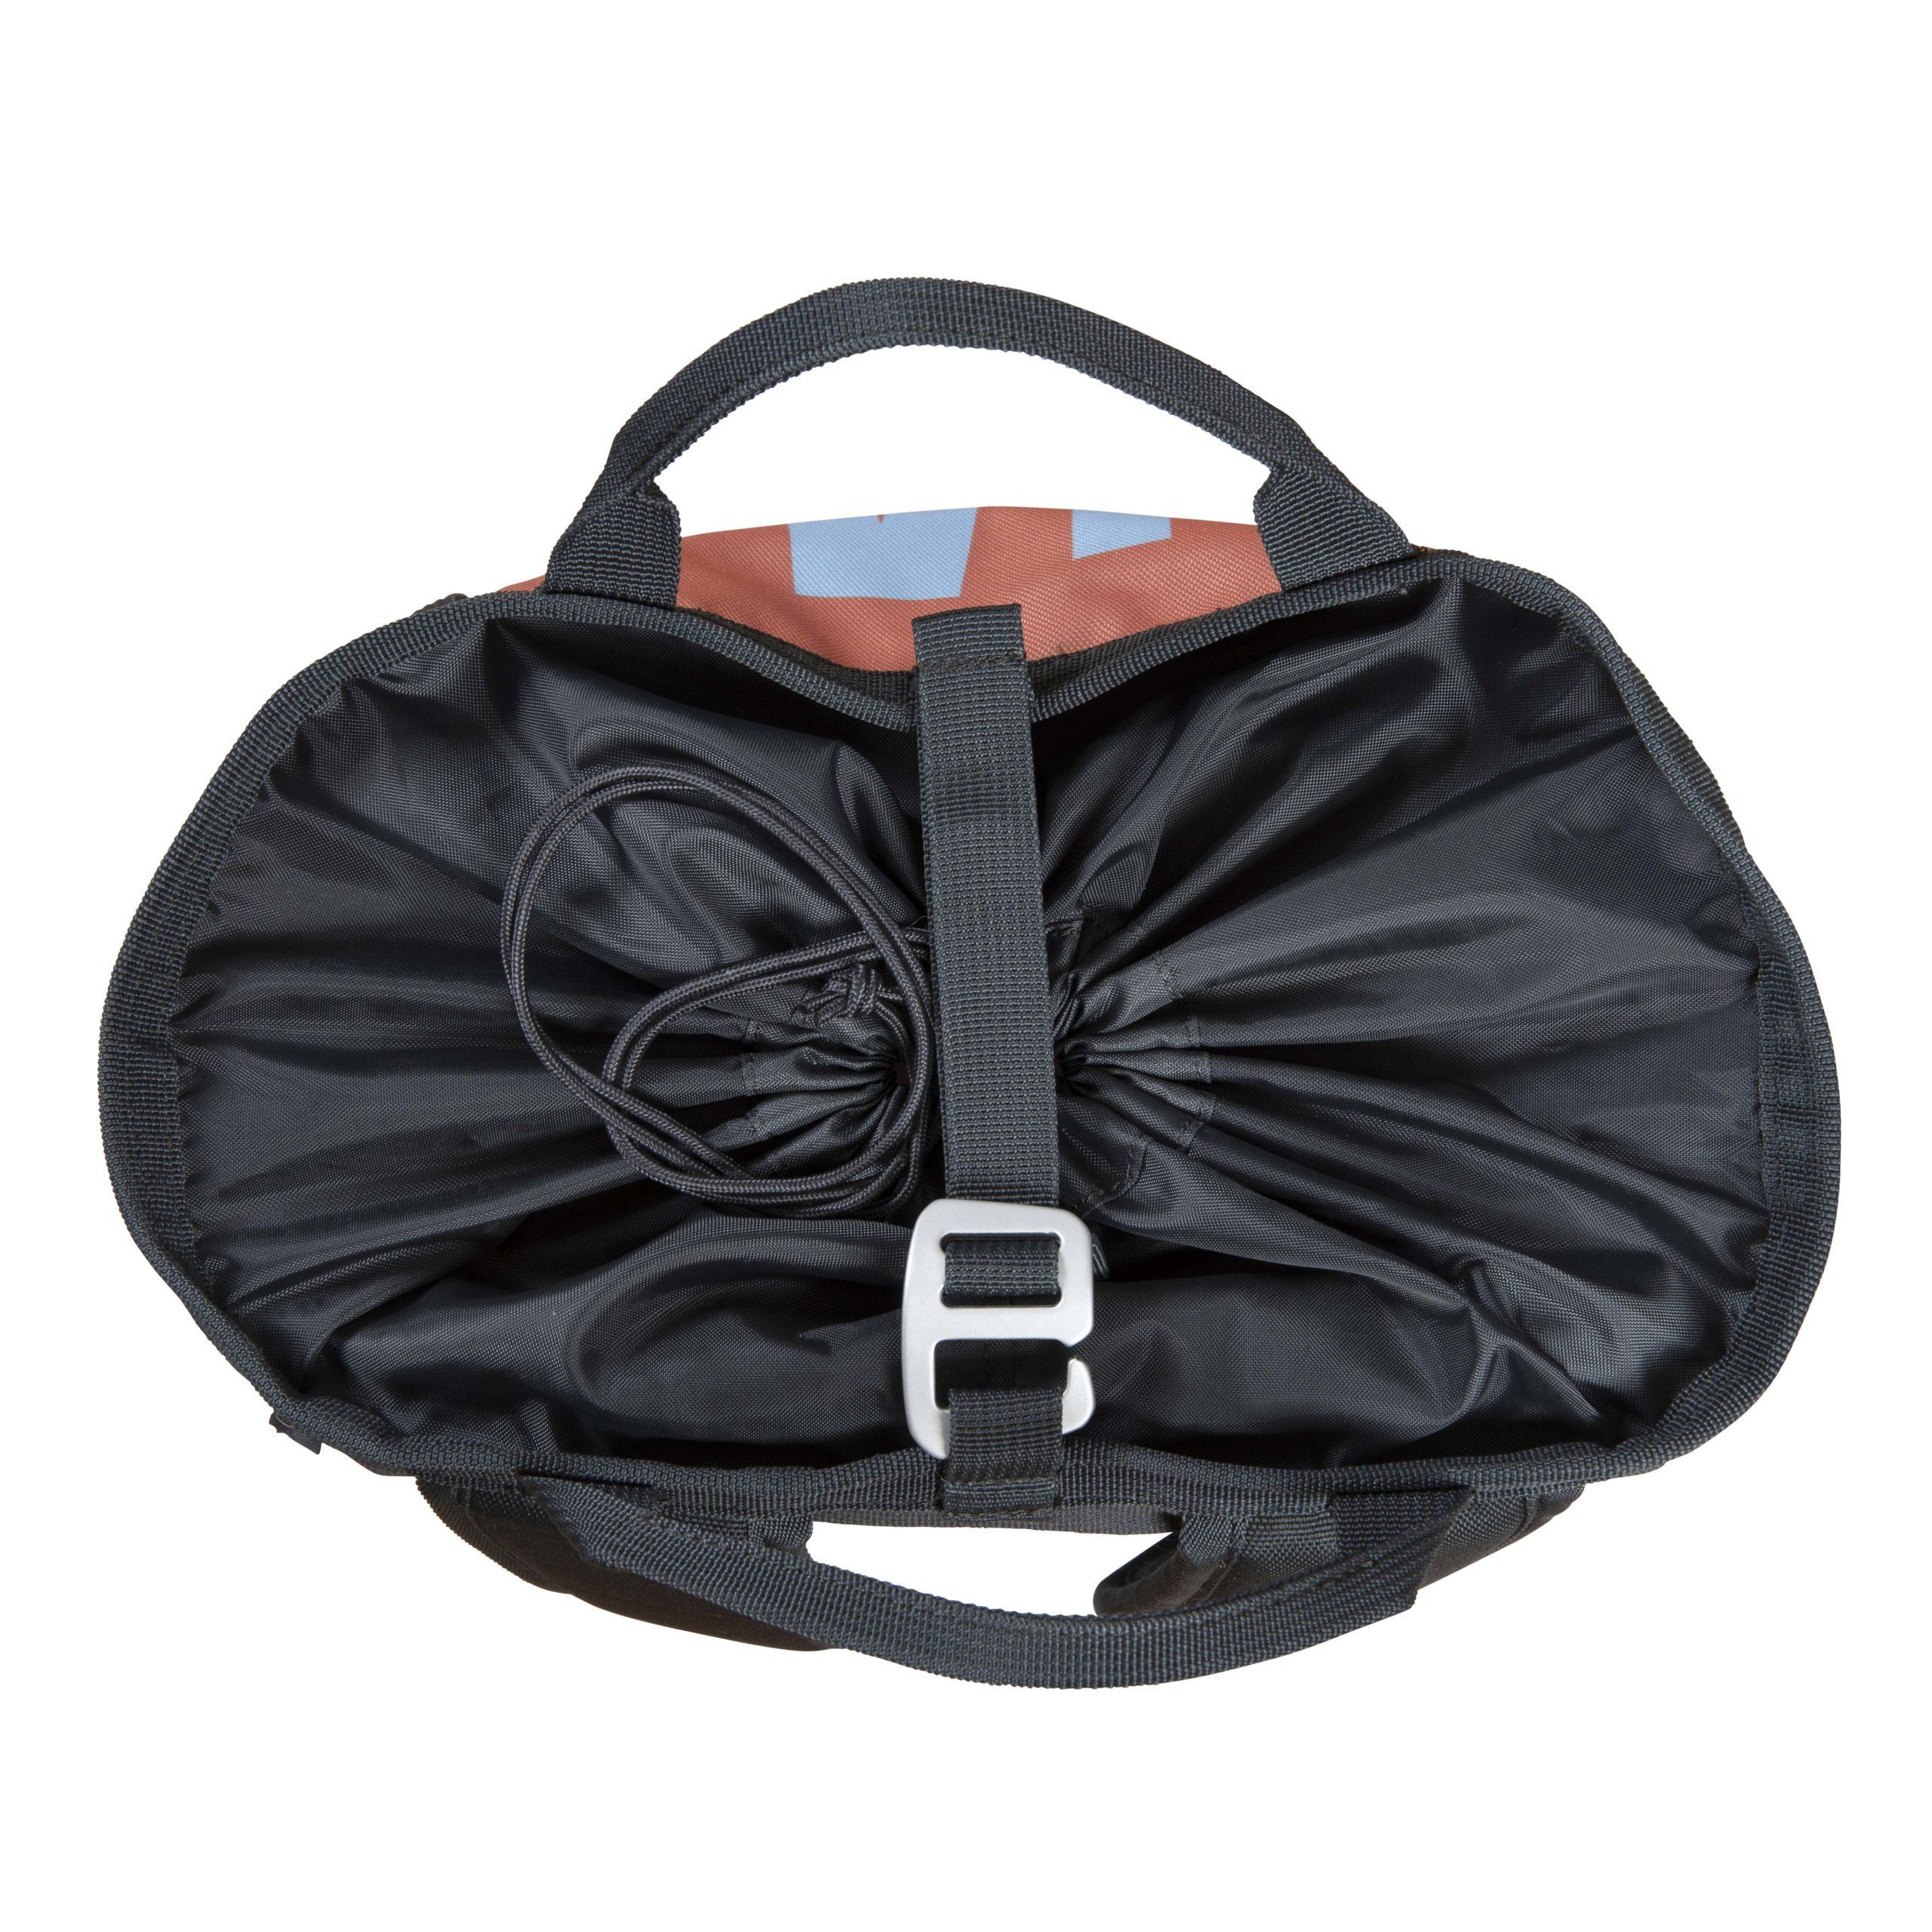 haulbag backpack